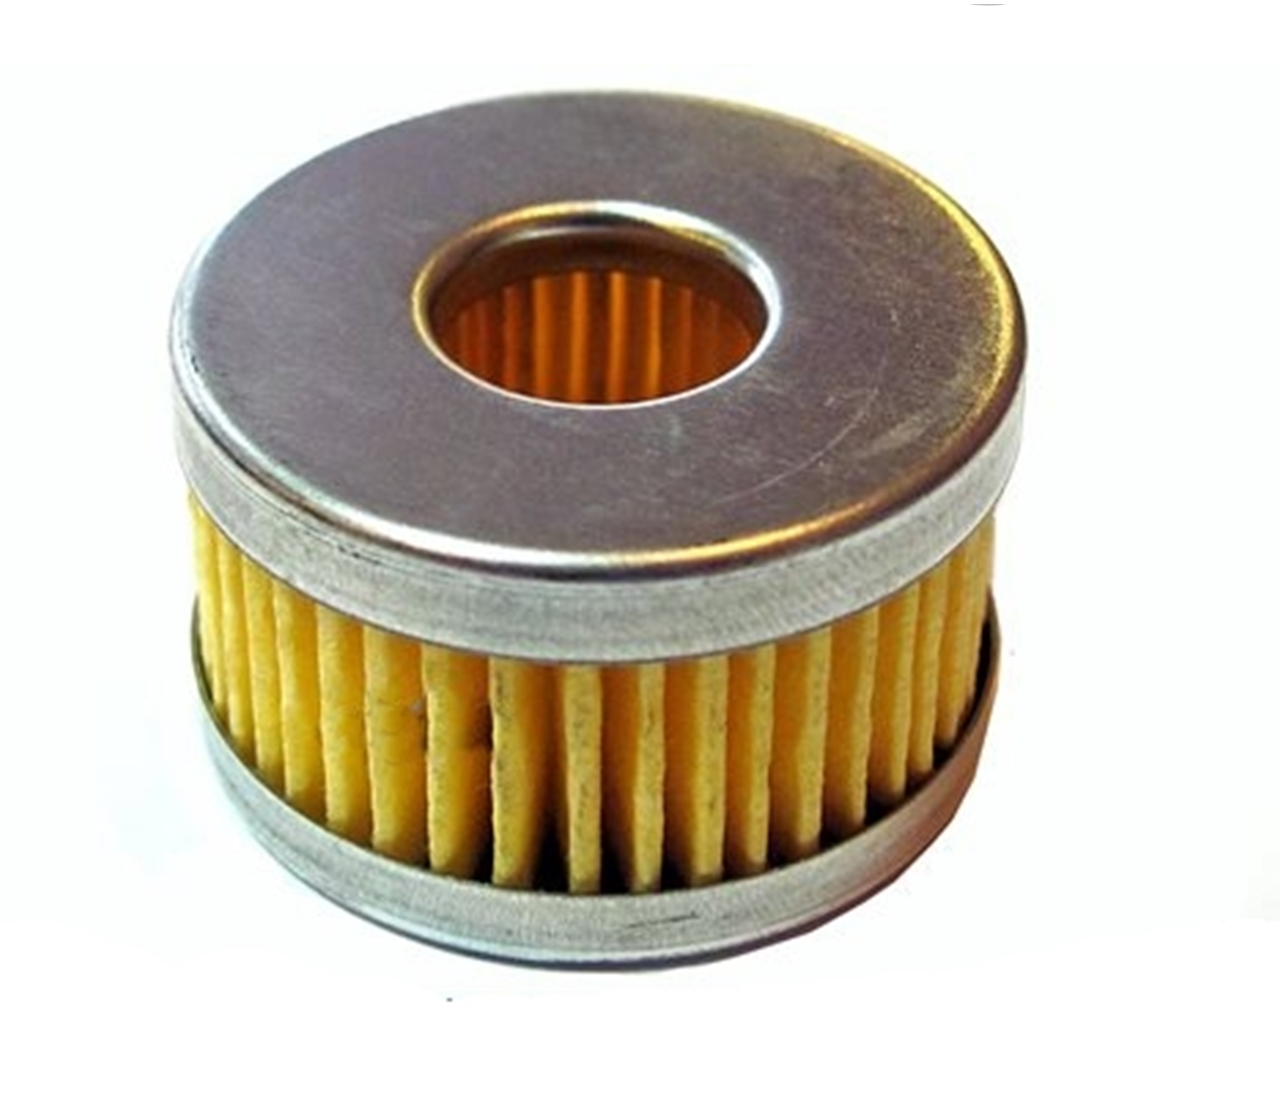 Фильтр Agc VITO Compact, Zenit Вклад Filterek Цска